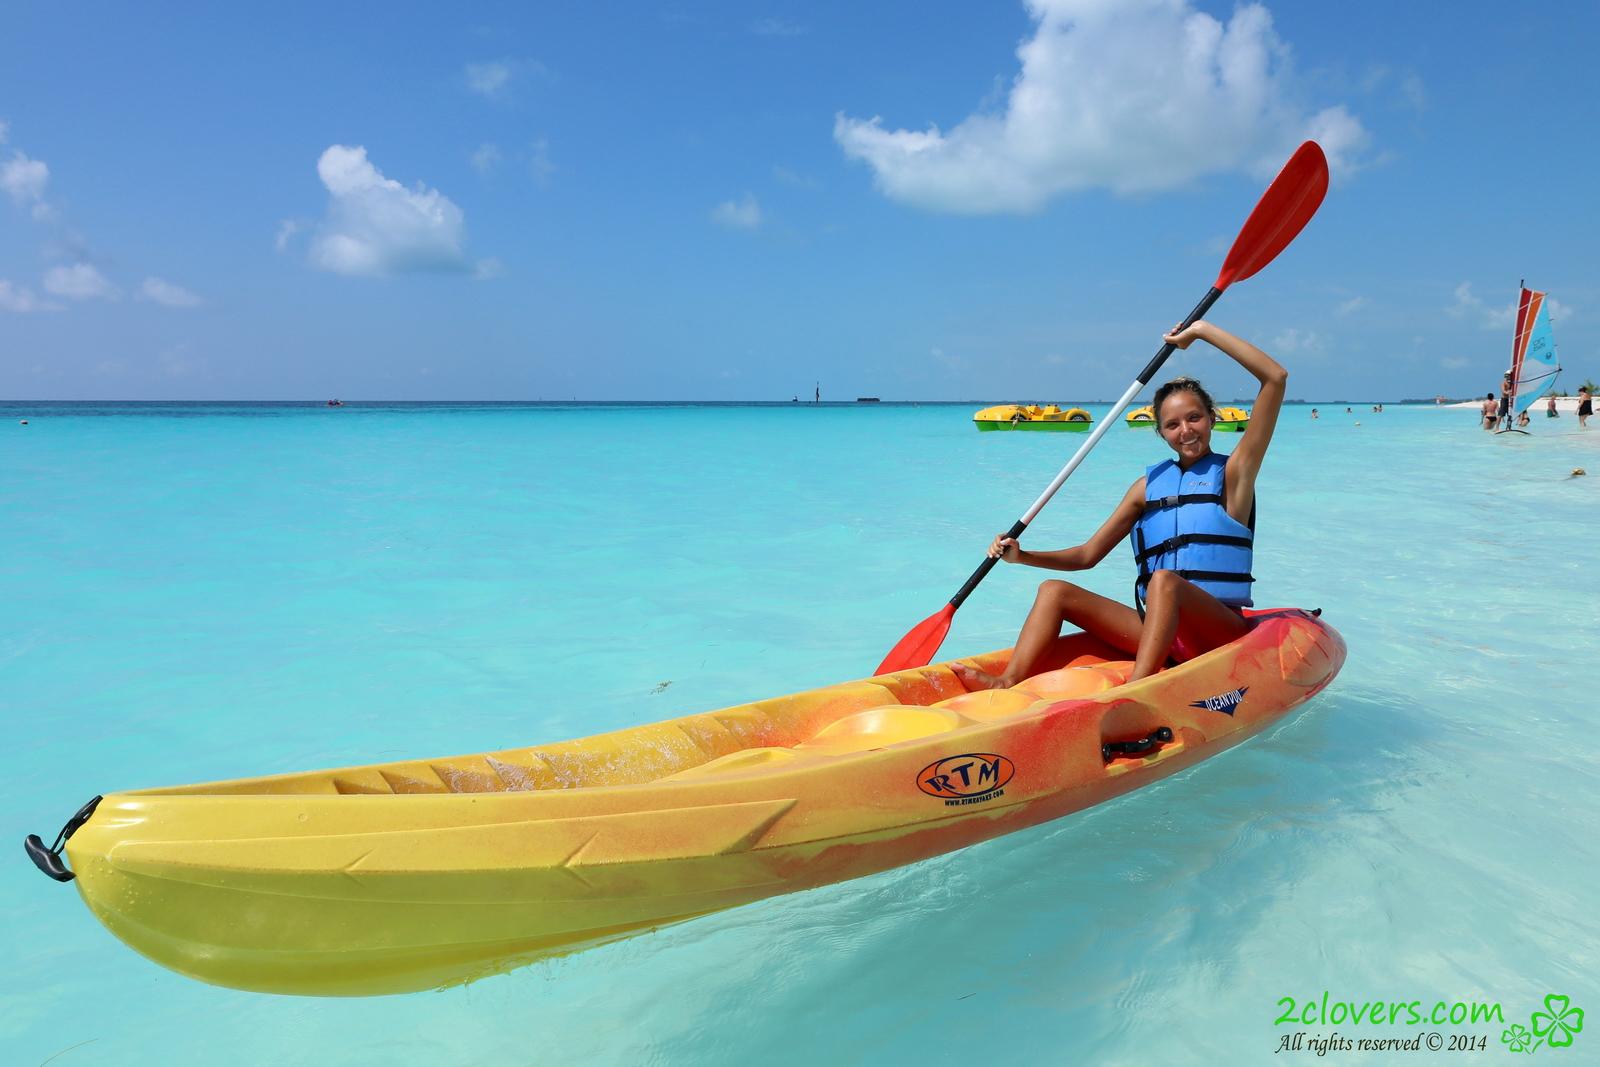 katya-clover-naked-on-sirena-beach-seaside-2clovers-02